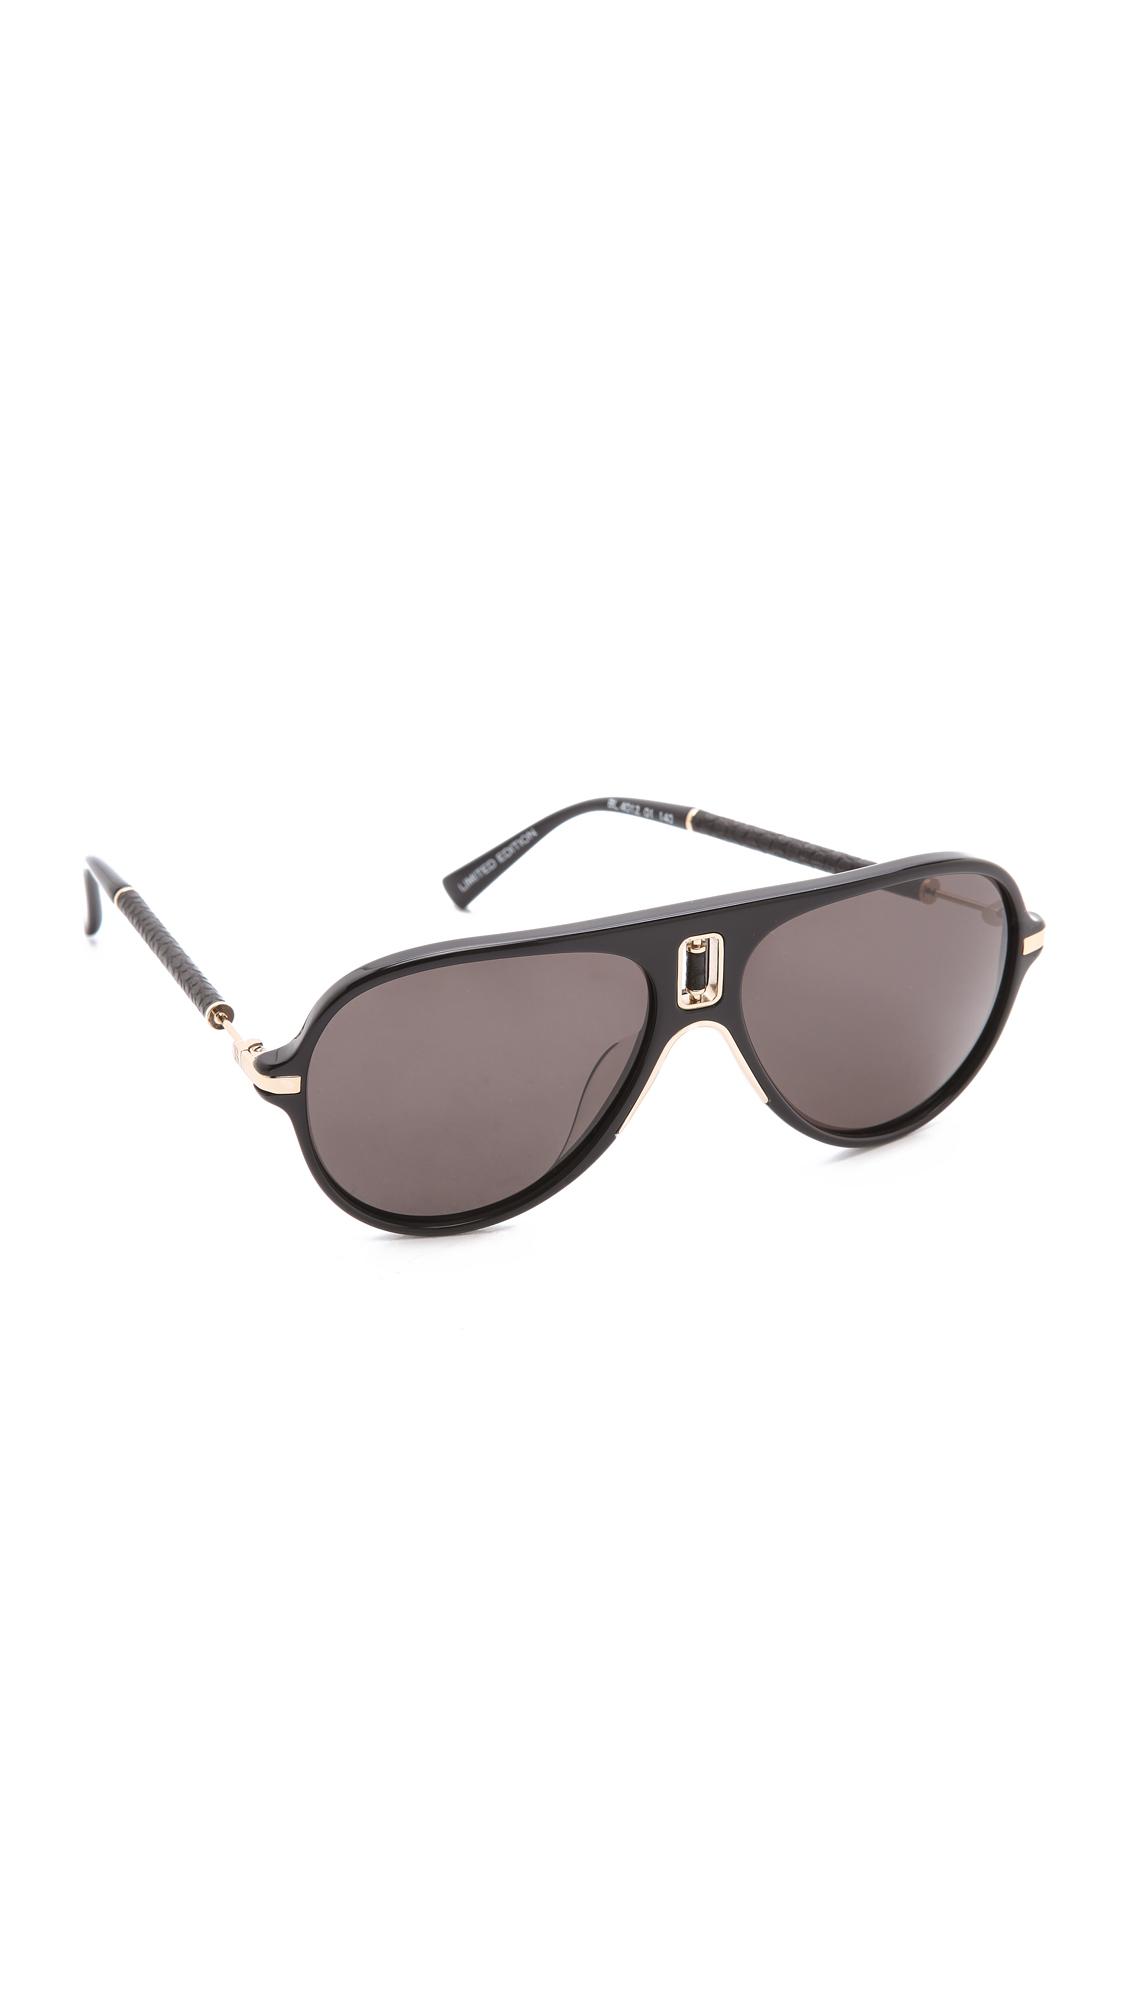 Balmain Studio Aviator Sunglasses  balmain studio oversized sunglasses in black lyst